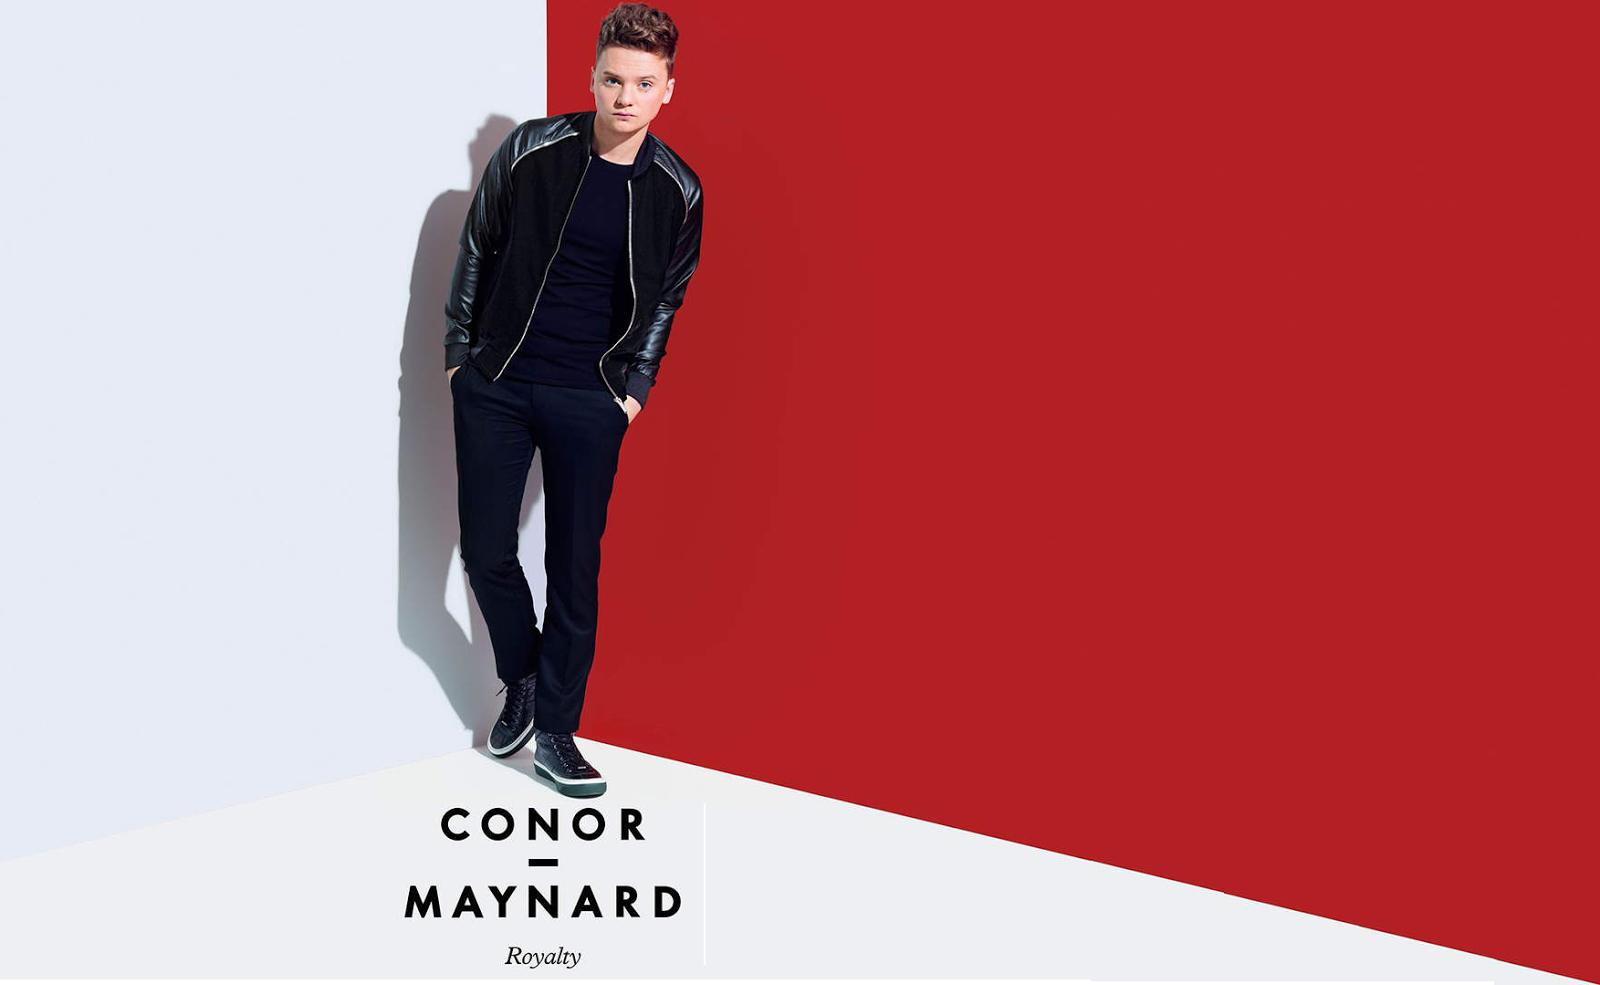 Conor Maynard - Royalty (Dalszovegkritika)